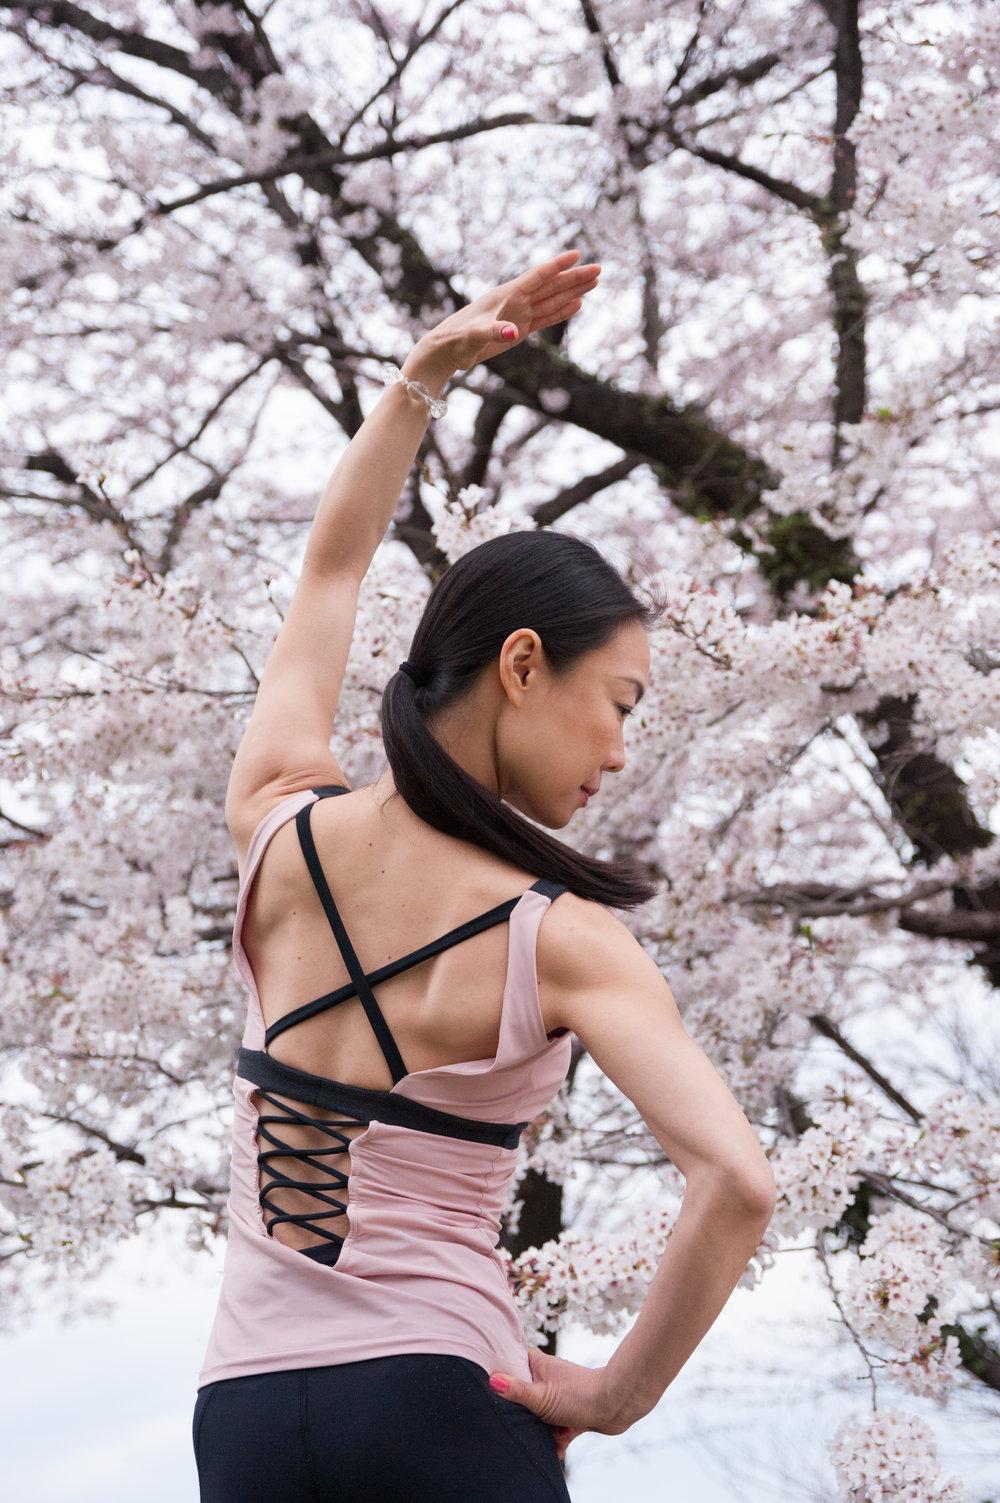 Sakura 2017 Back Side Pause 2479.jpg